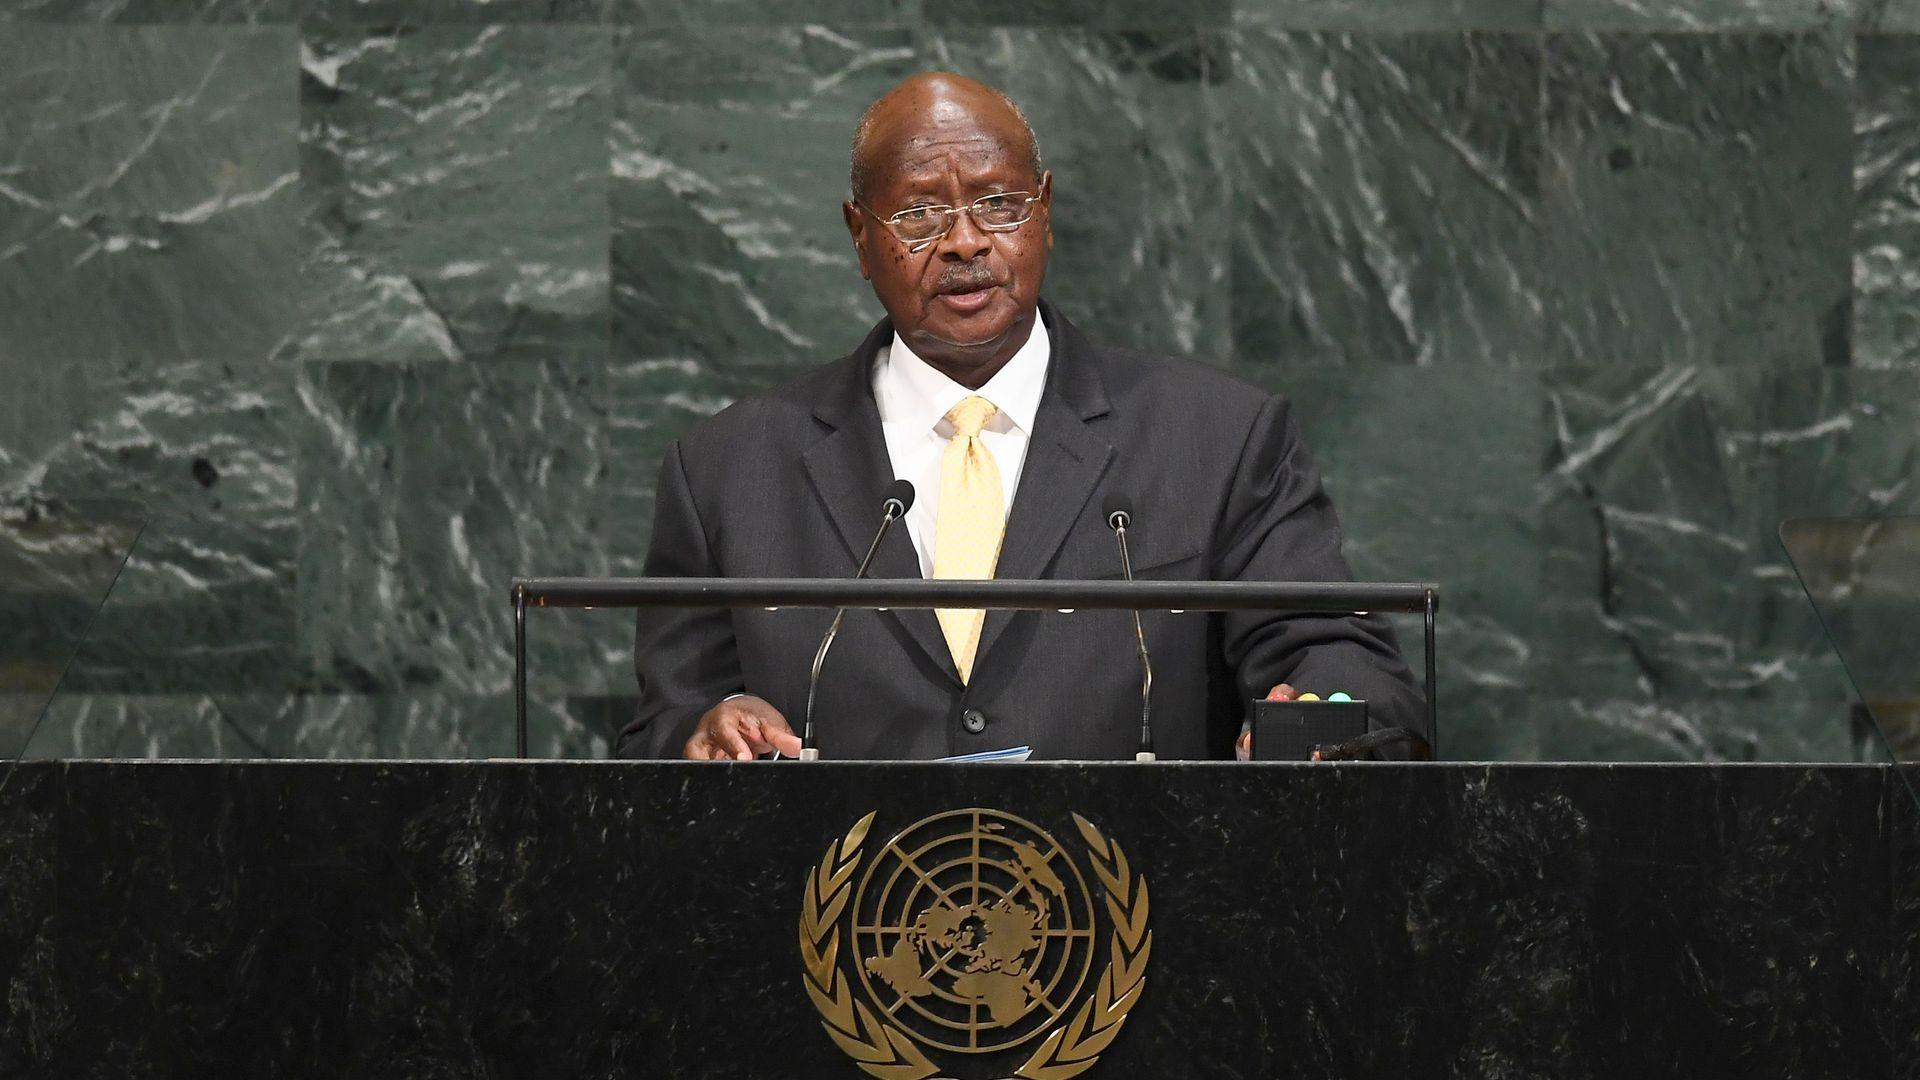 Ugandan President Museveni at lectern at UN Assembly